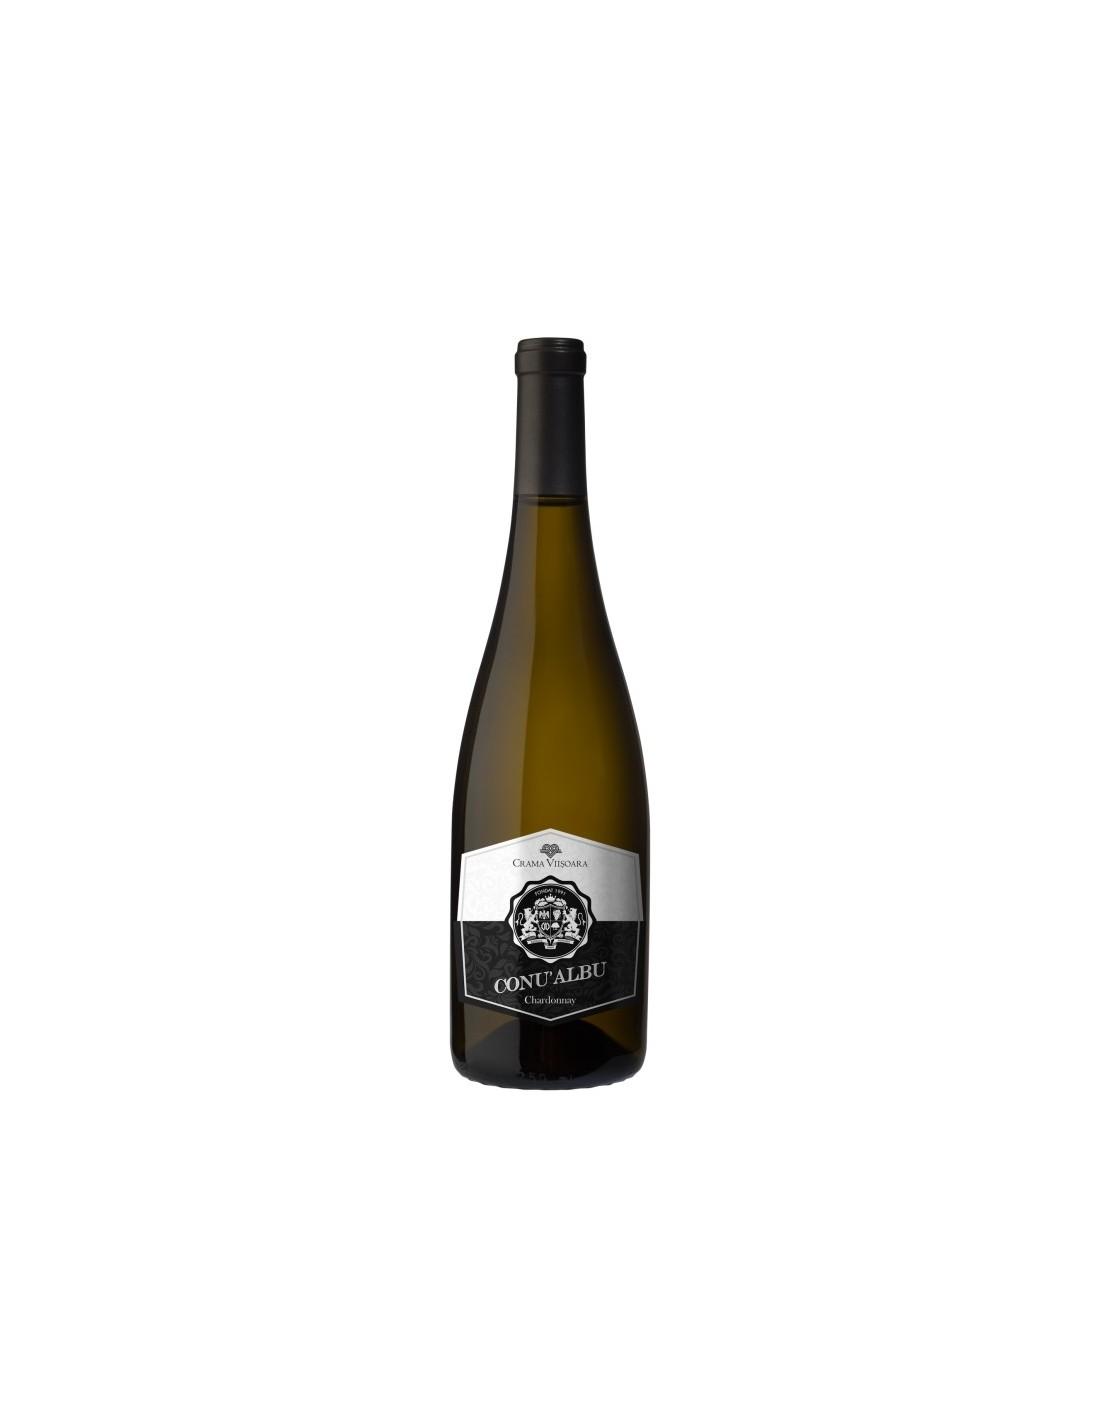 Vin alb sec, Chardonnay, Conu' Albu Colinele Dobrogei, 0.75L, 14% alc., Romania